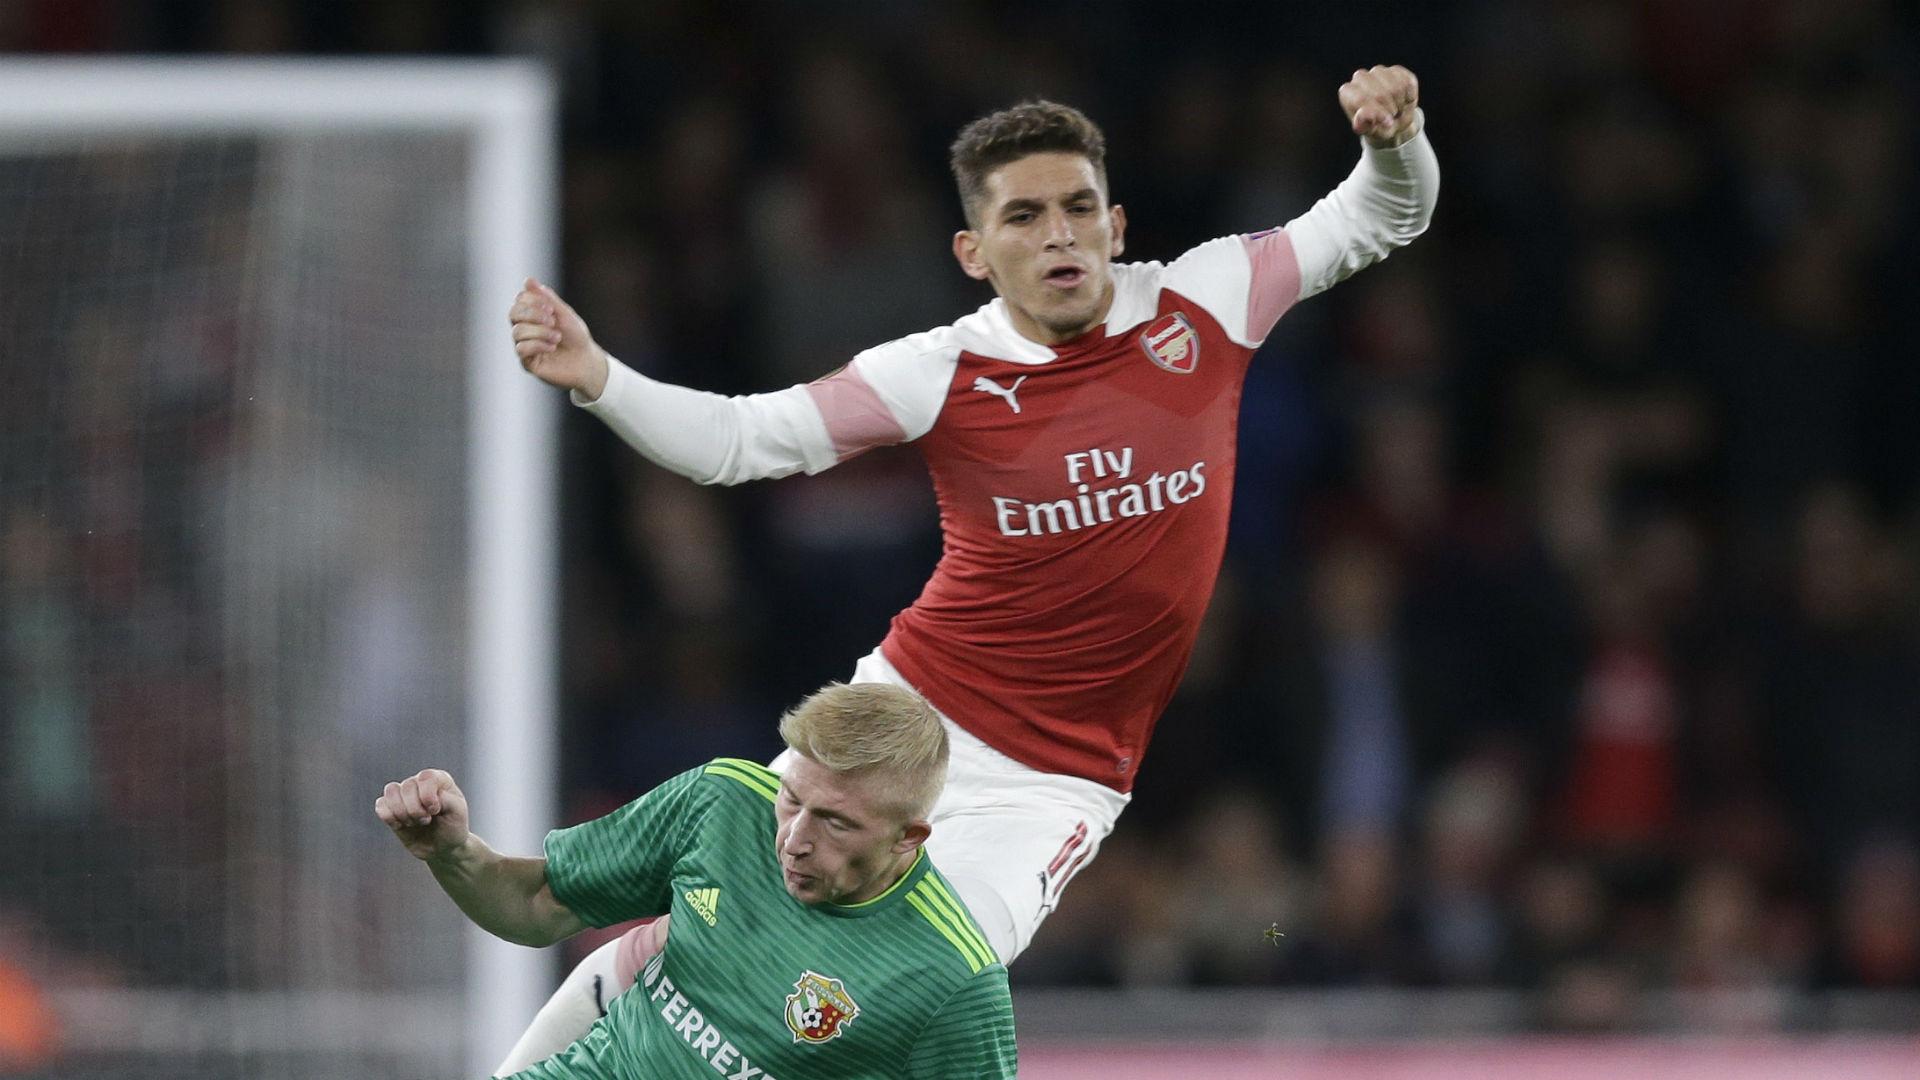 Unai Emery demands improvement from Arsenal players